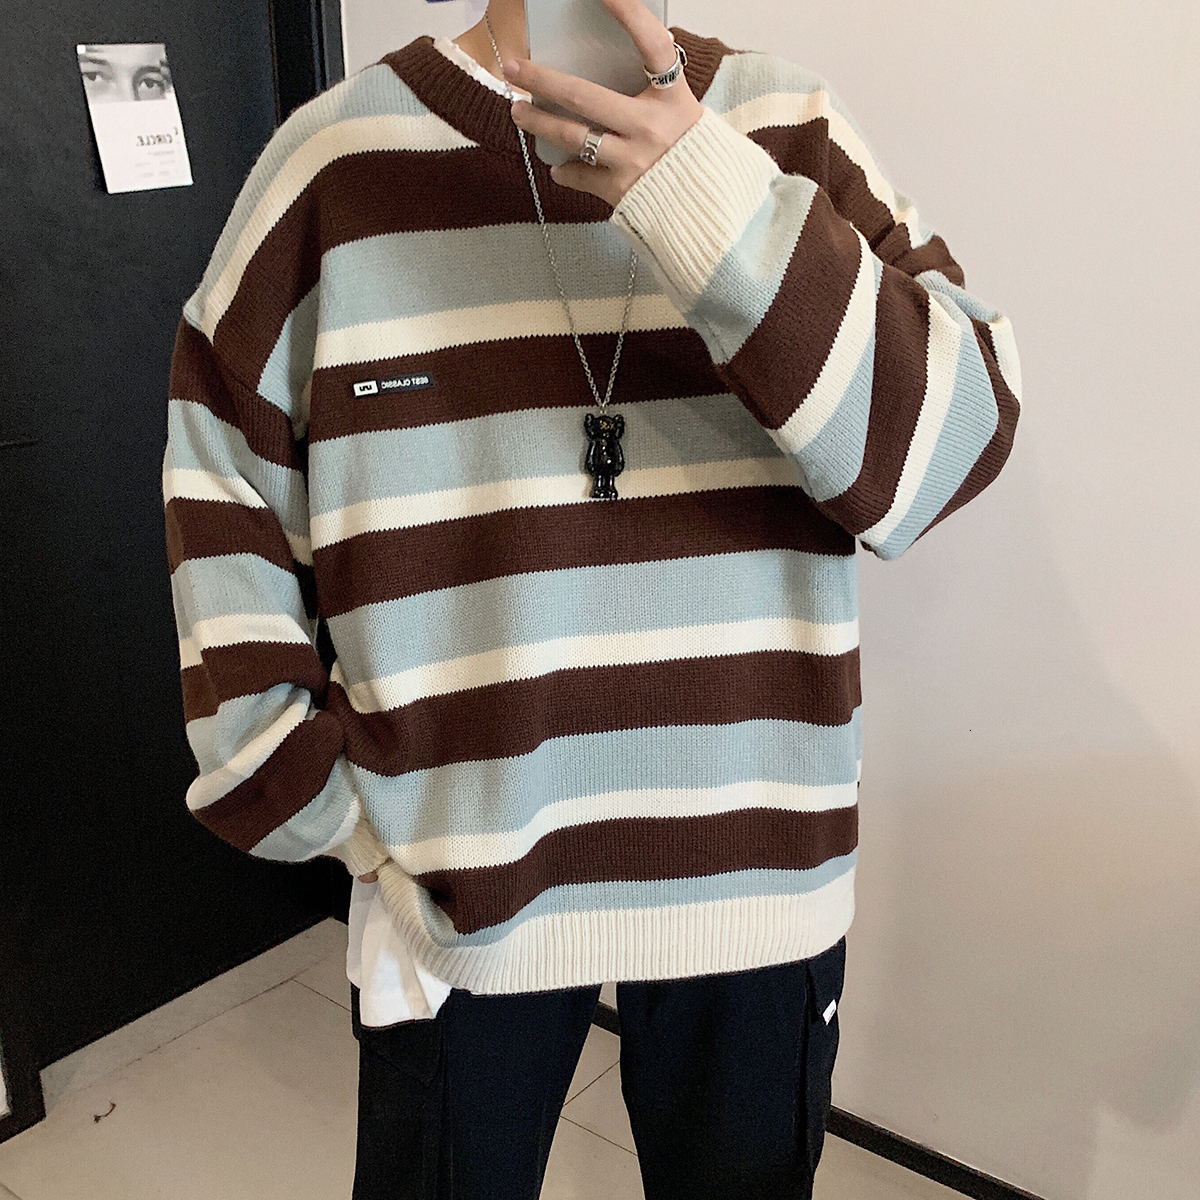 2019 Winter Men's In Warm Coats Casual Cashmere Pullover Stripe Knitting Woolen Sweater V-neck Sleeve Single Man Knit Size M-2XL